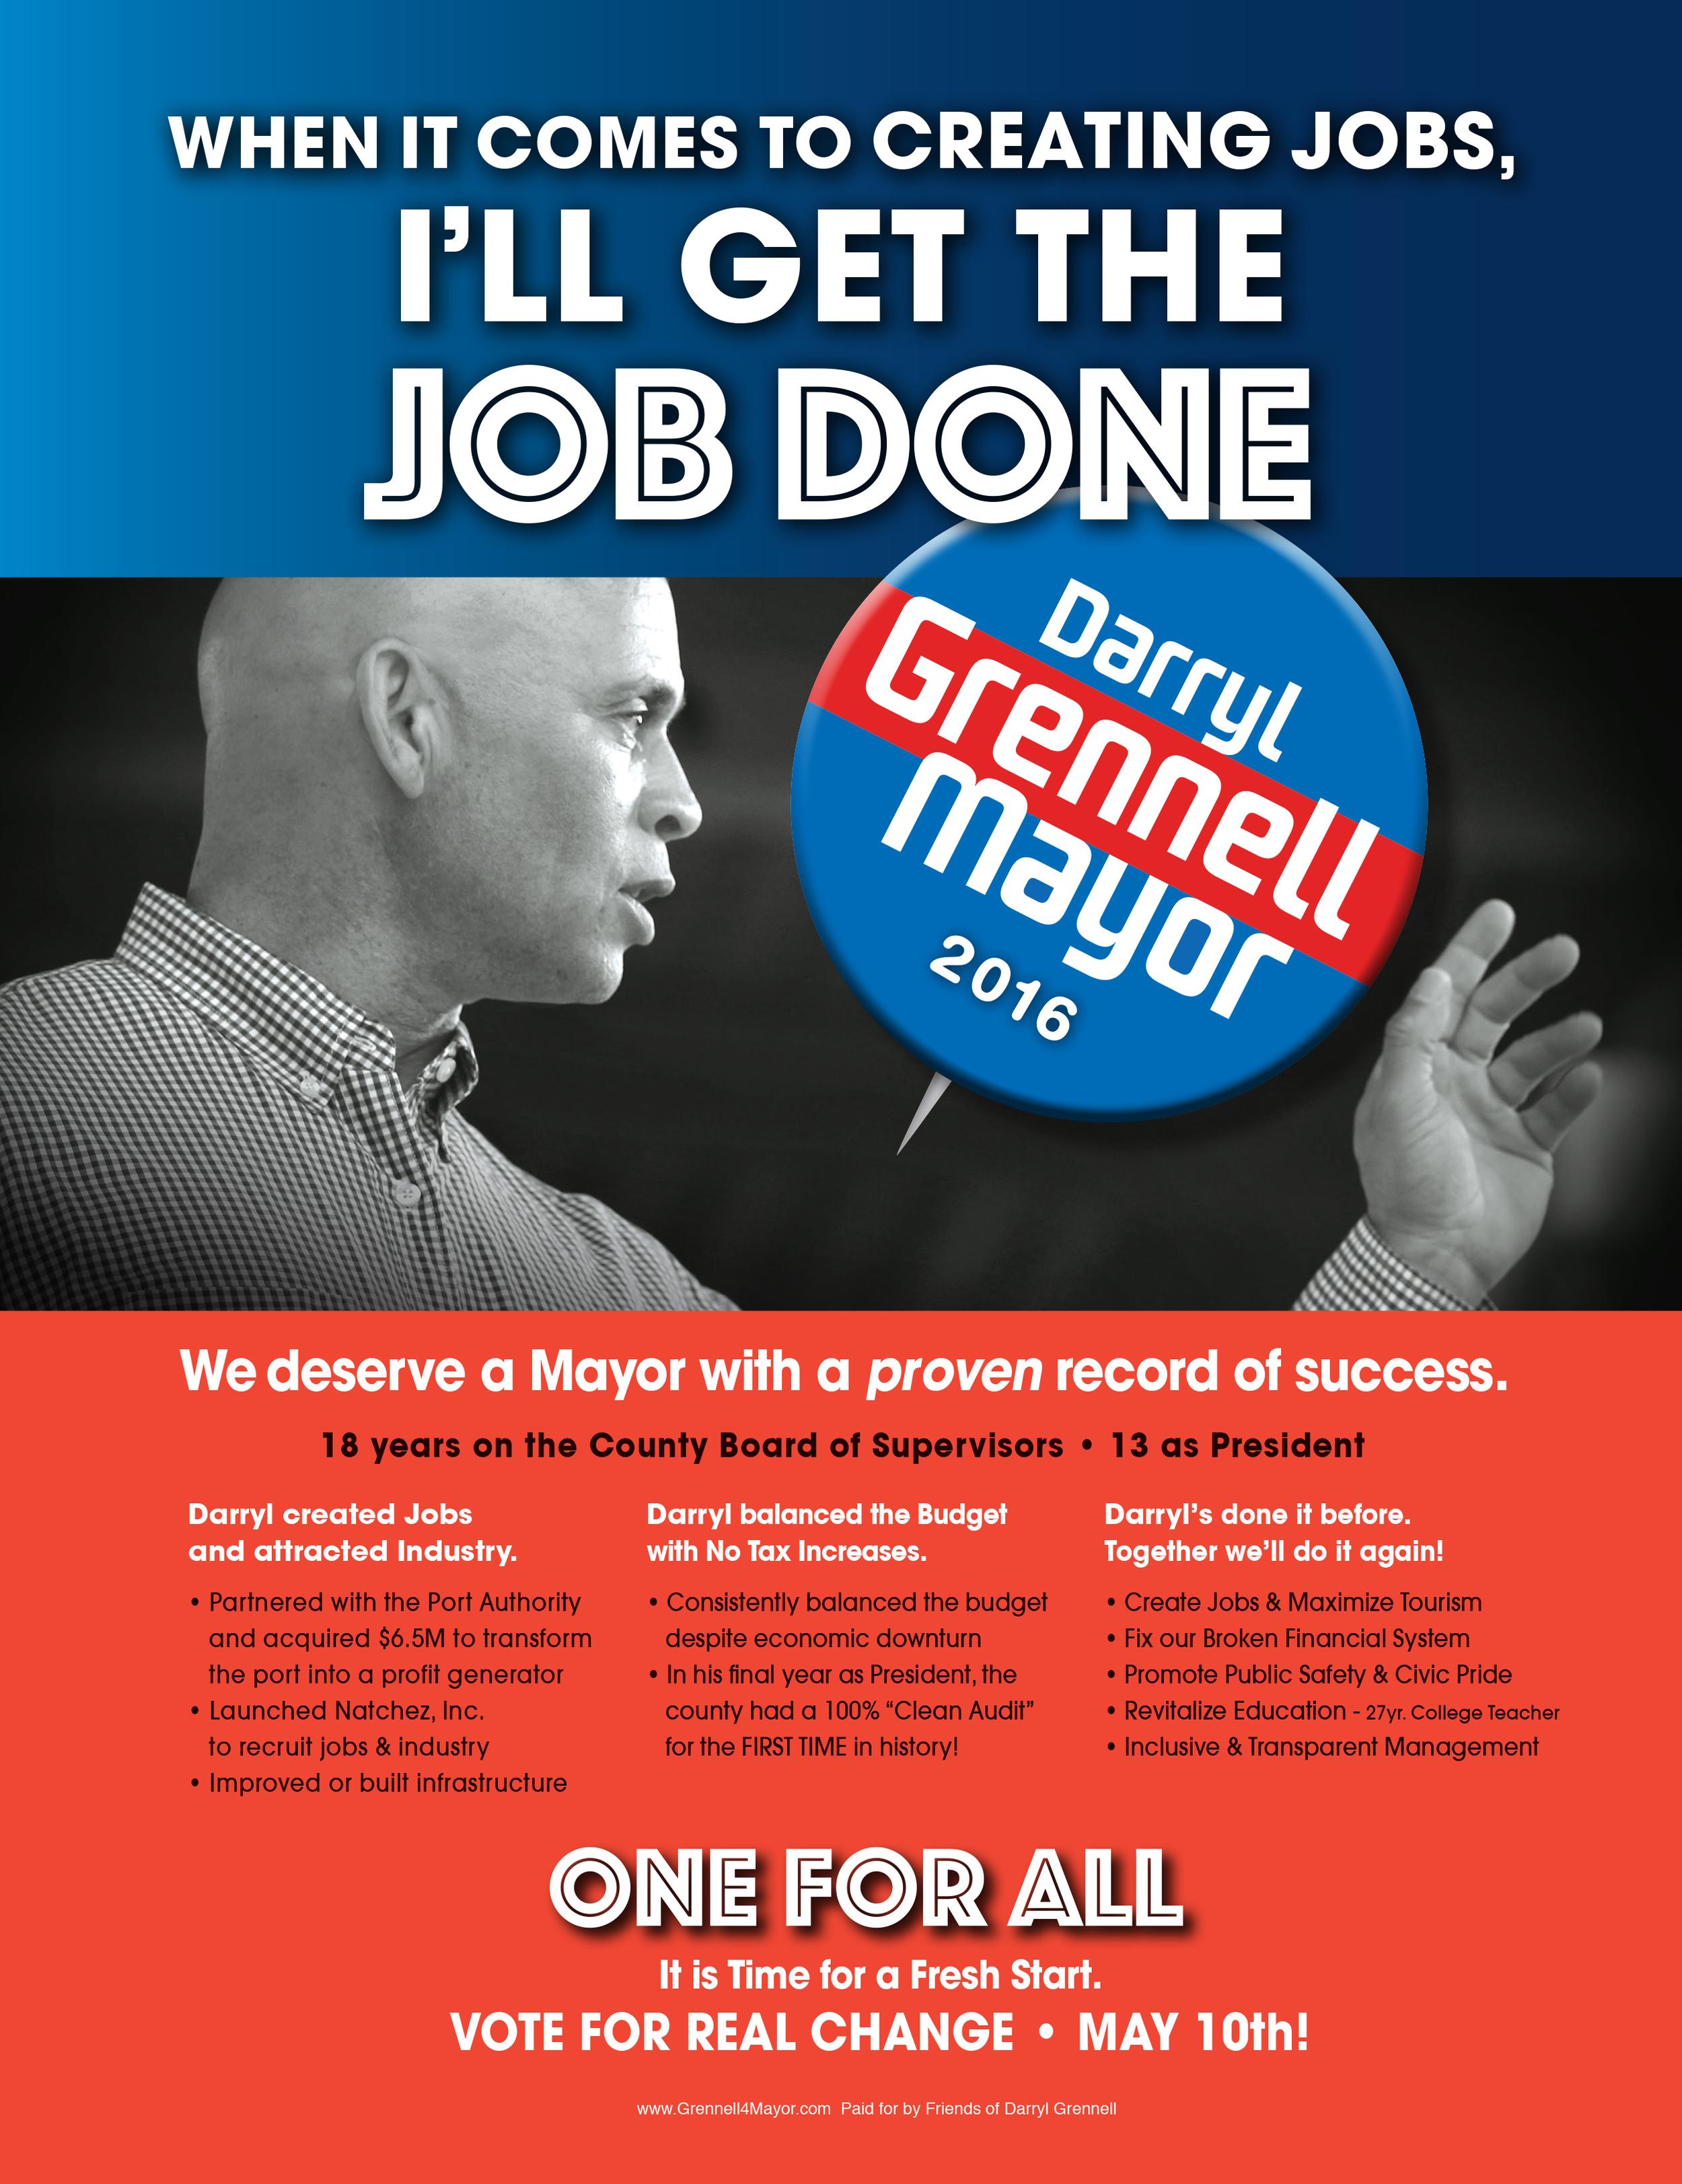 Grennell-BluffsAd-JobDone-FINAL.png